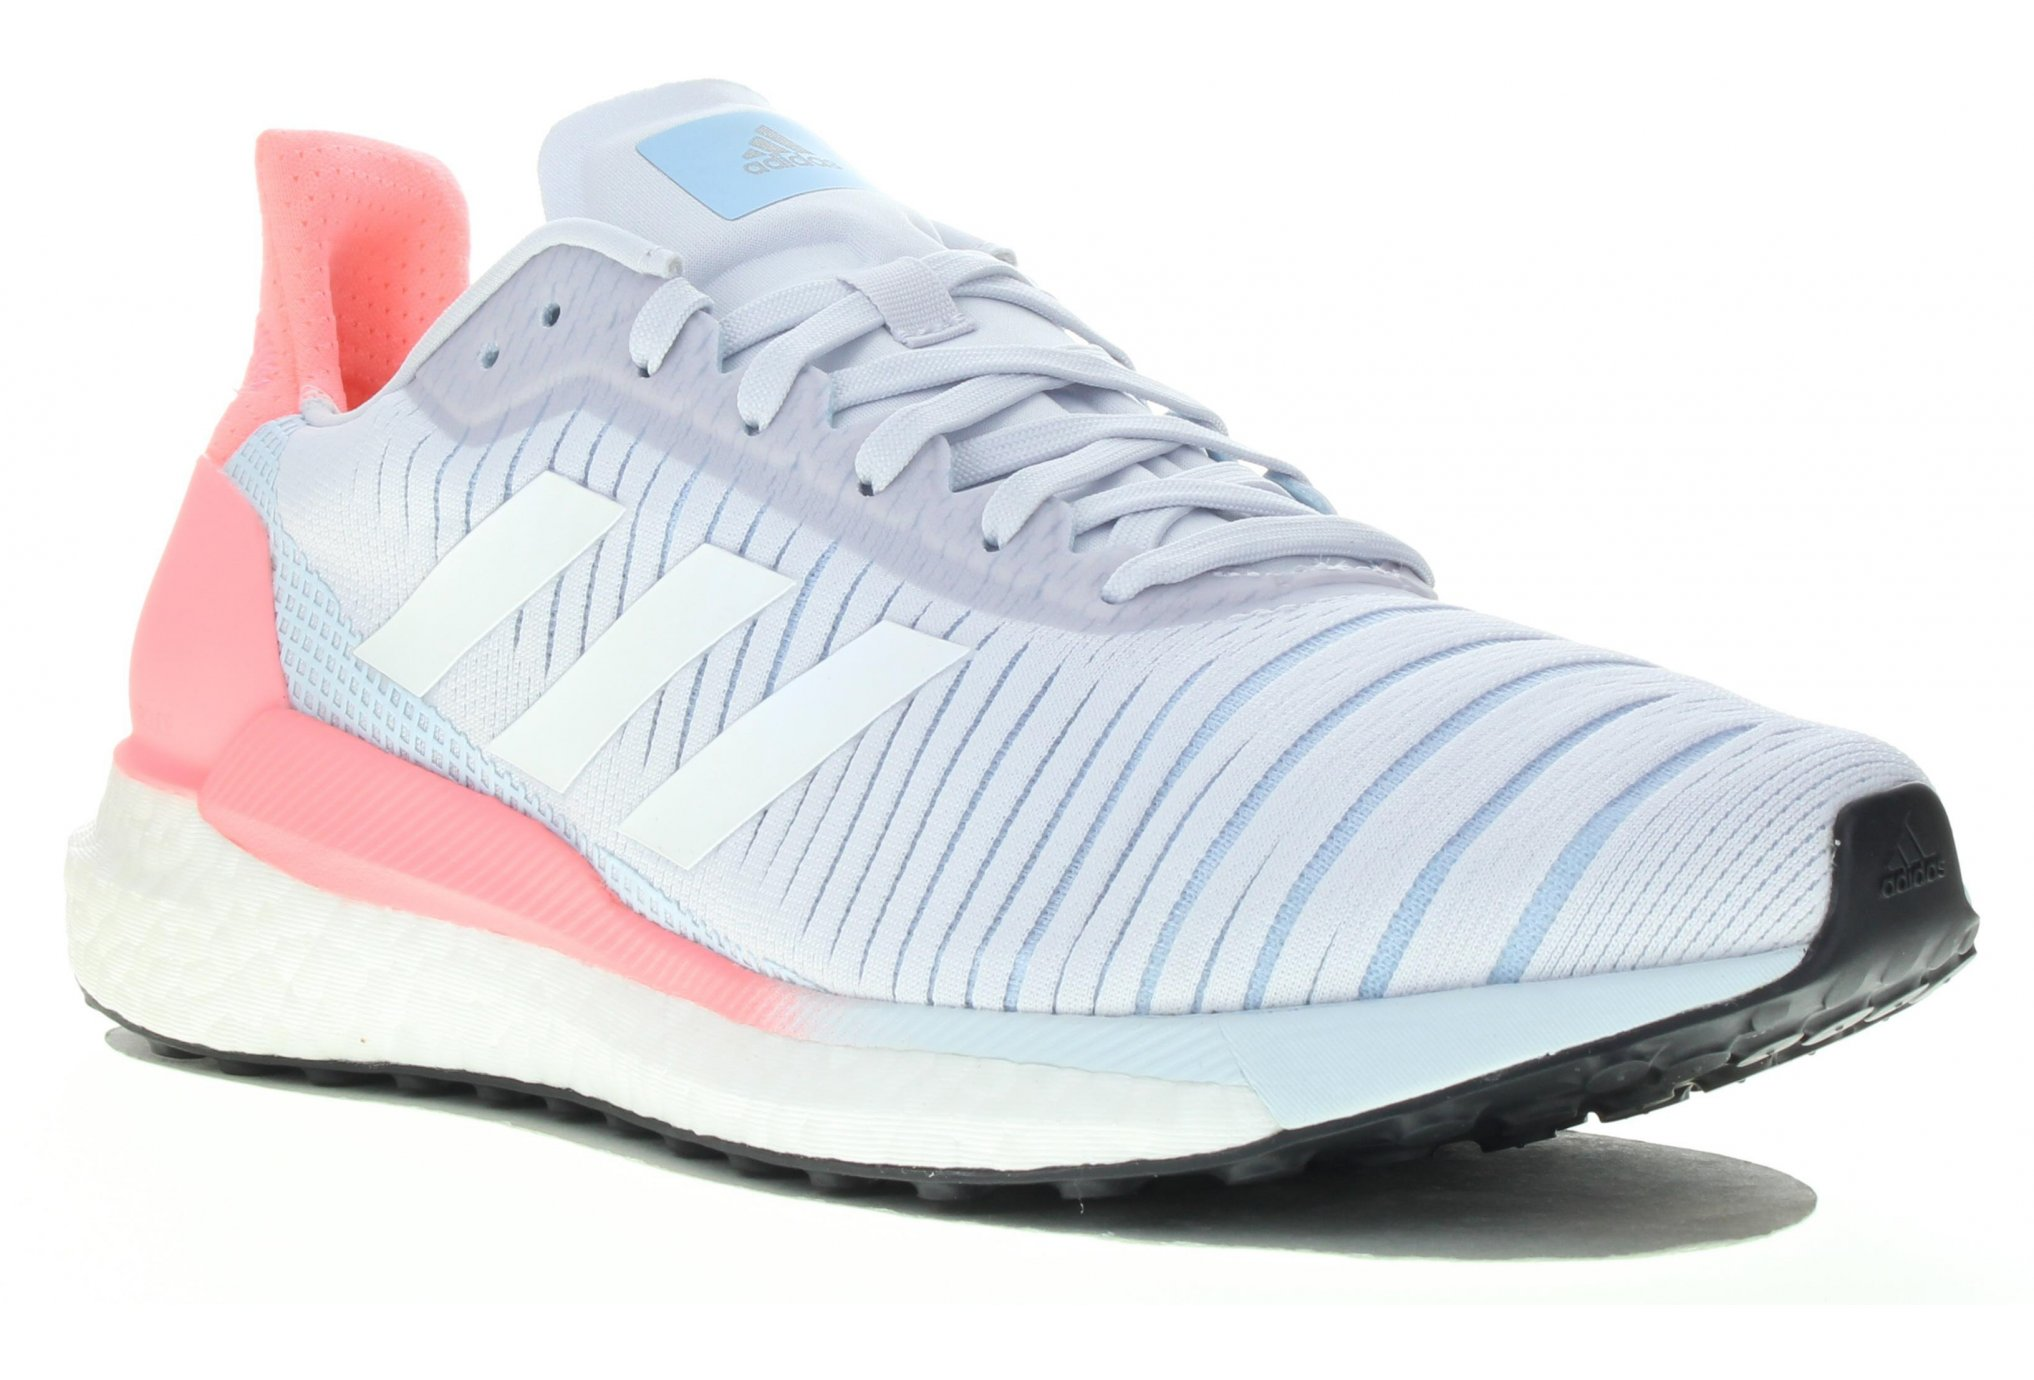 adidas Solar Glide 19 W Chaussures running femme